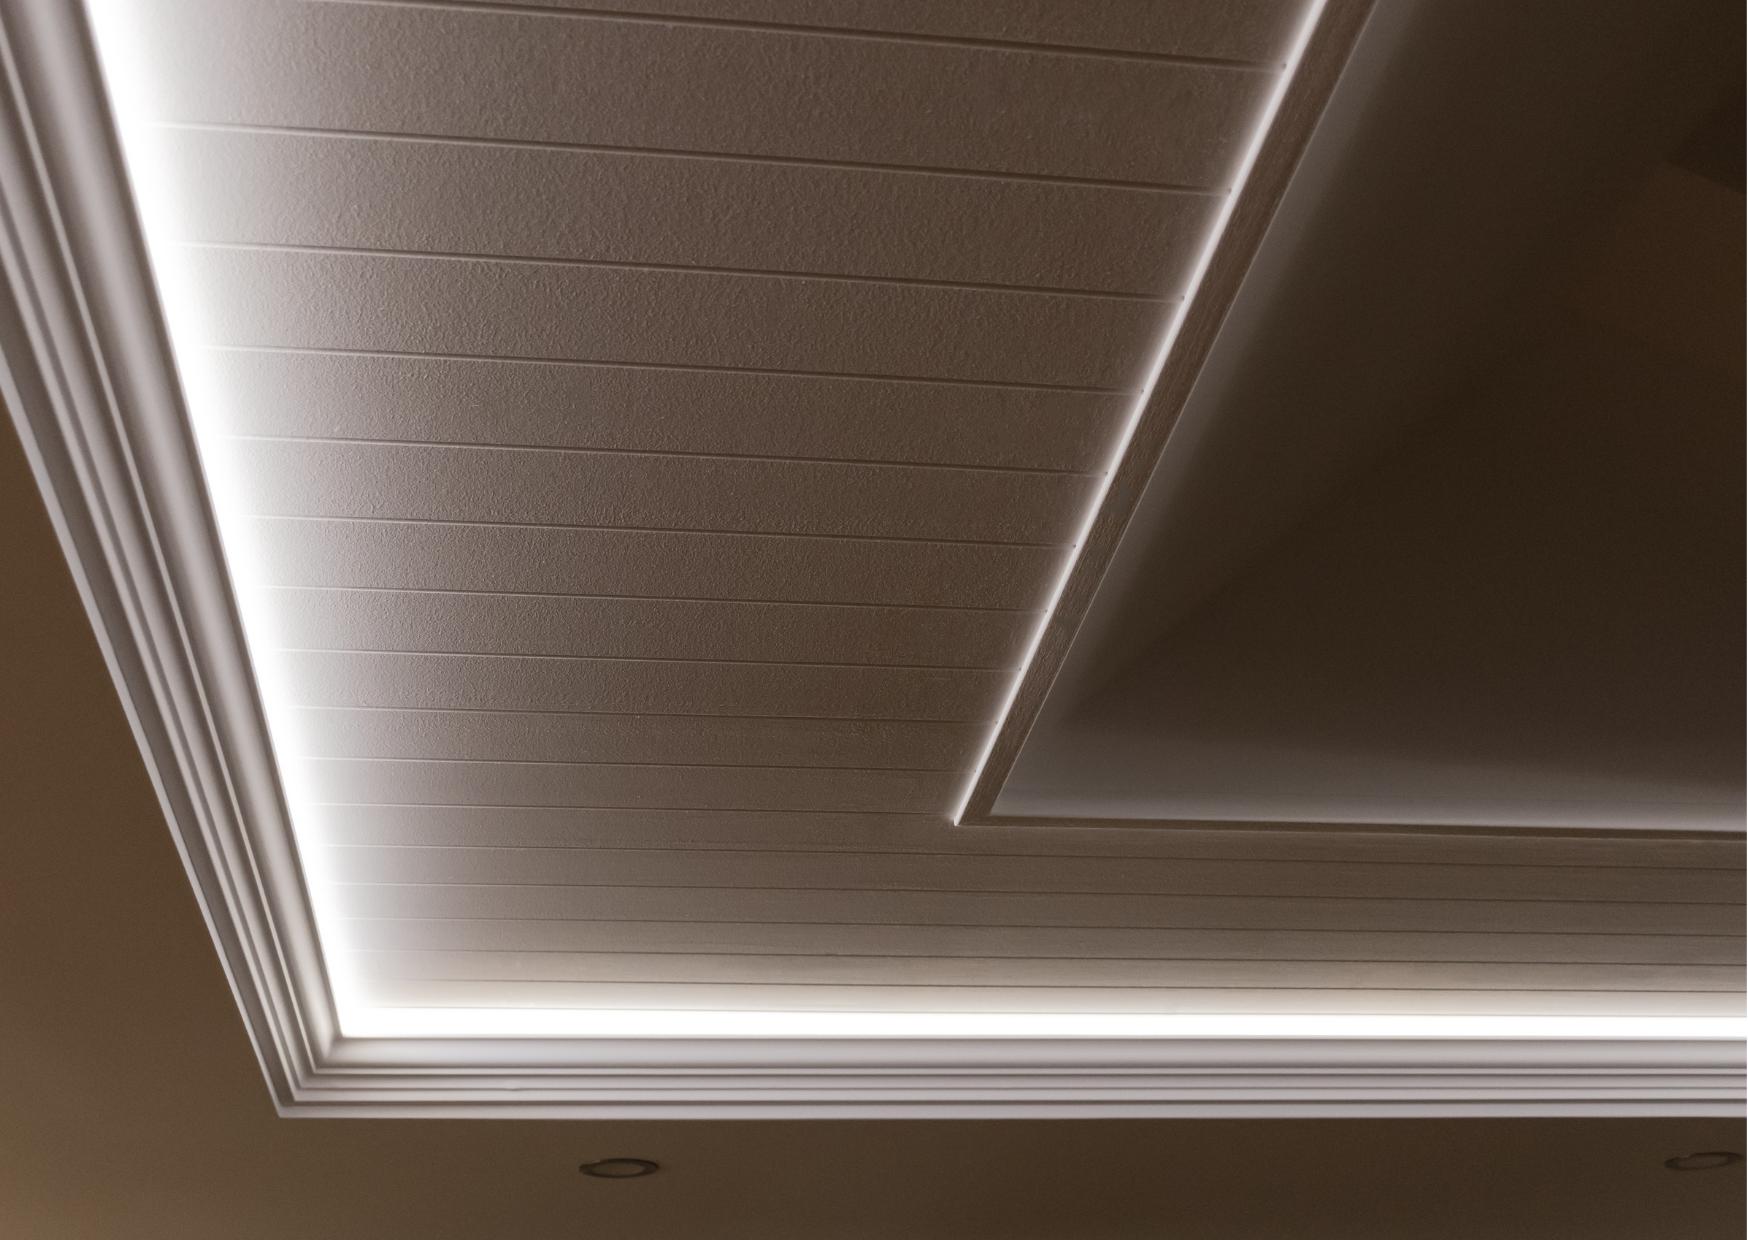 Lichtplanung ⚡So gelingt die perfekte Planung der Beleuchtung 🔎